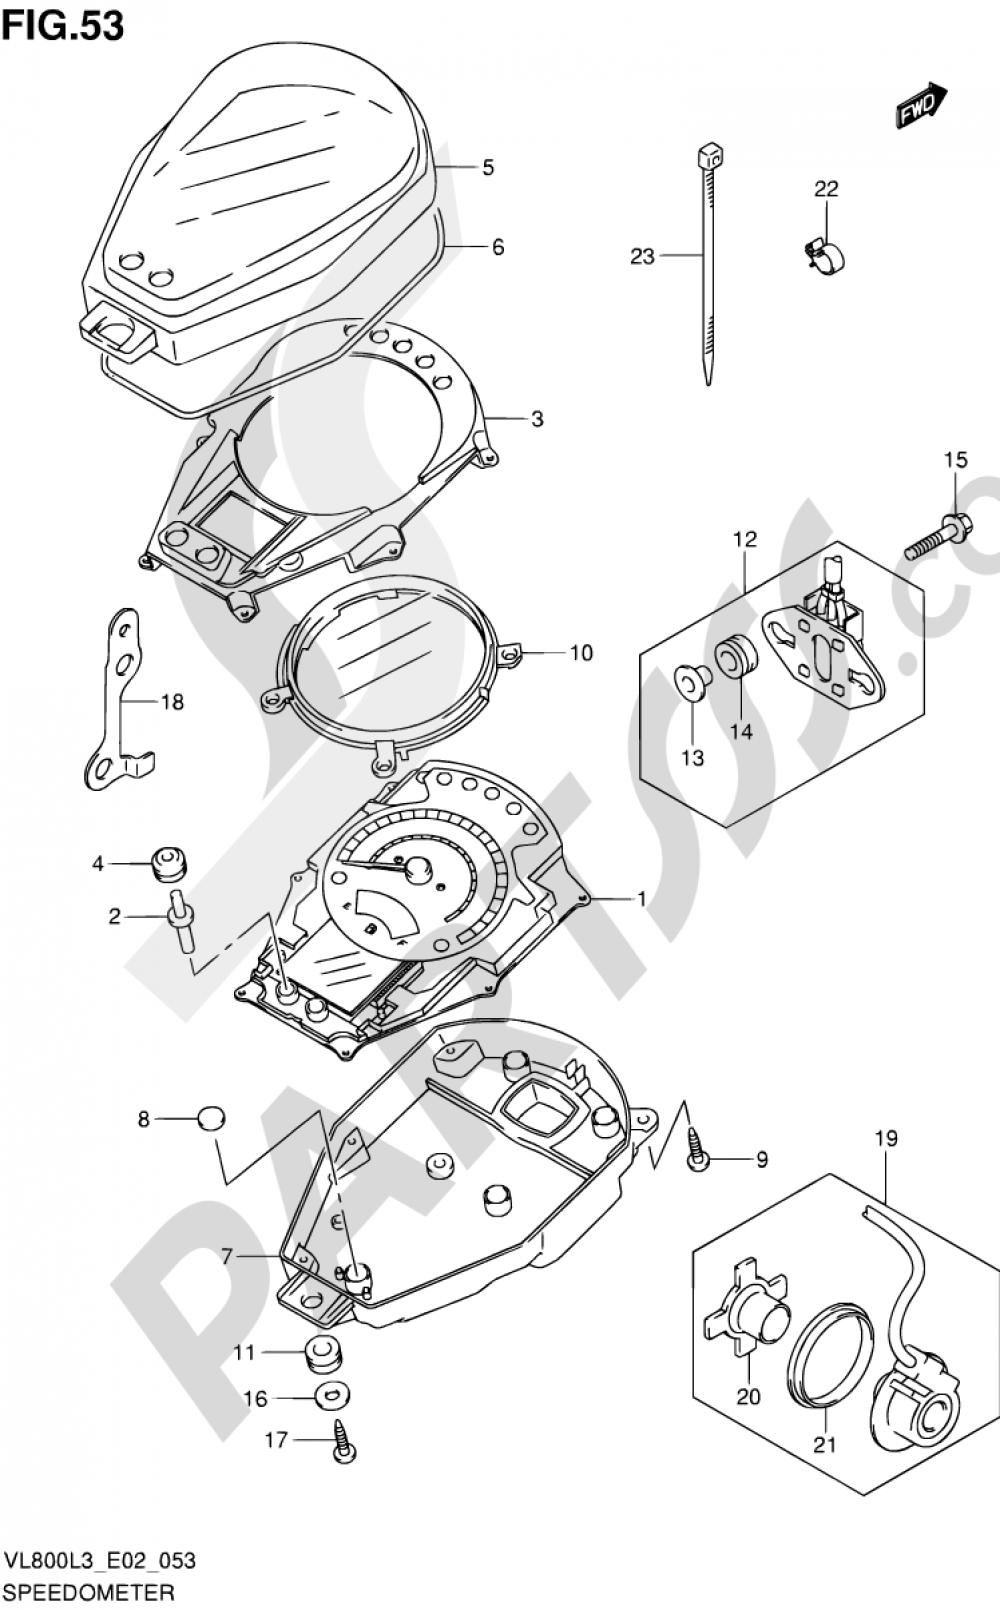 53 - SPEEDOMETER (VL800L3 E02) Suzuki INTRUDER VL800C 2013